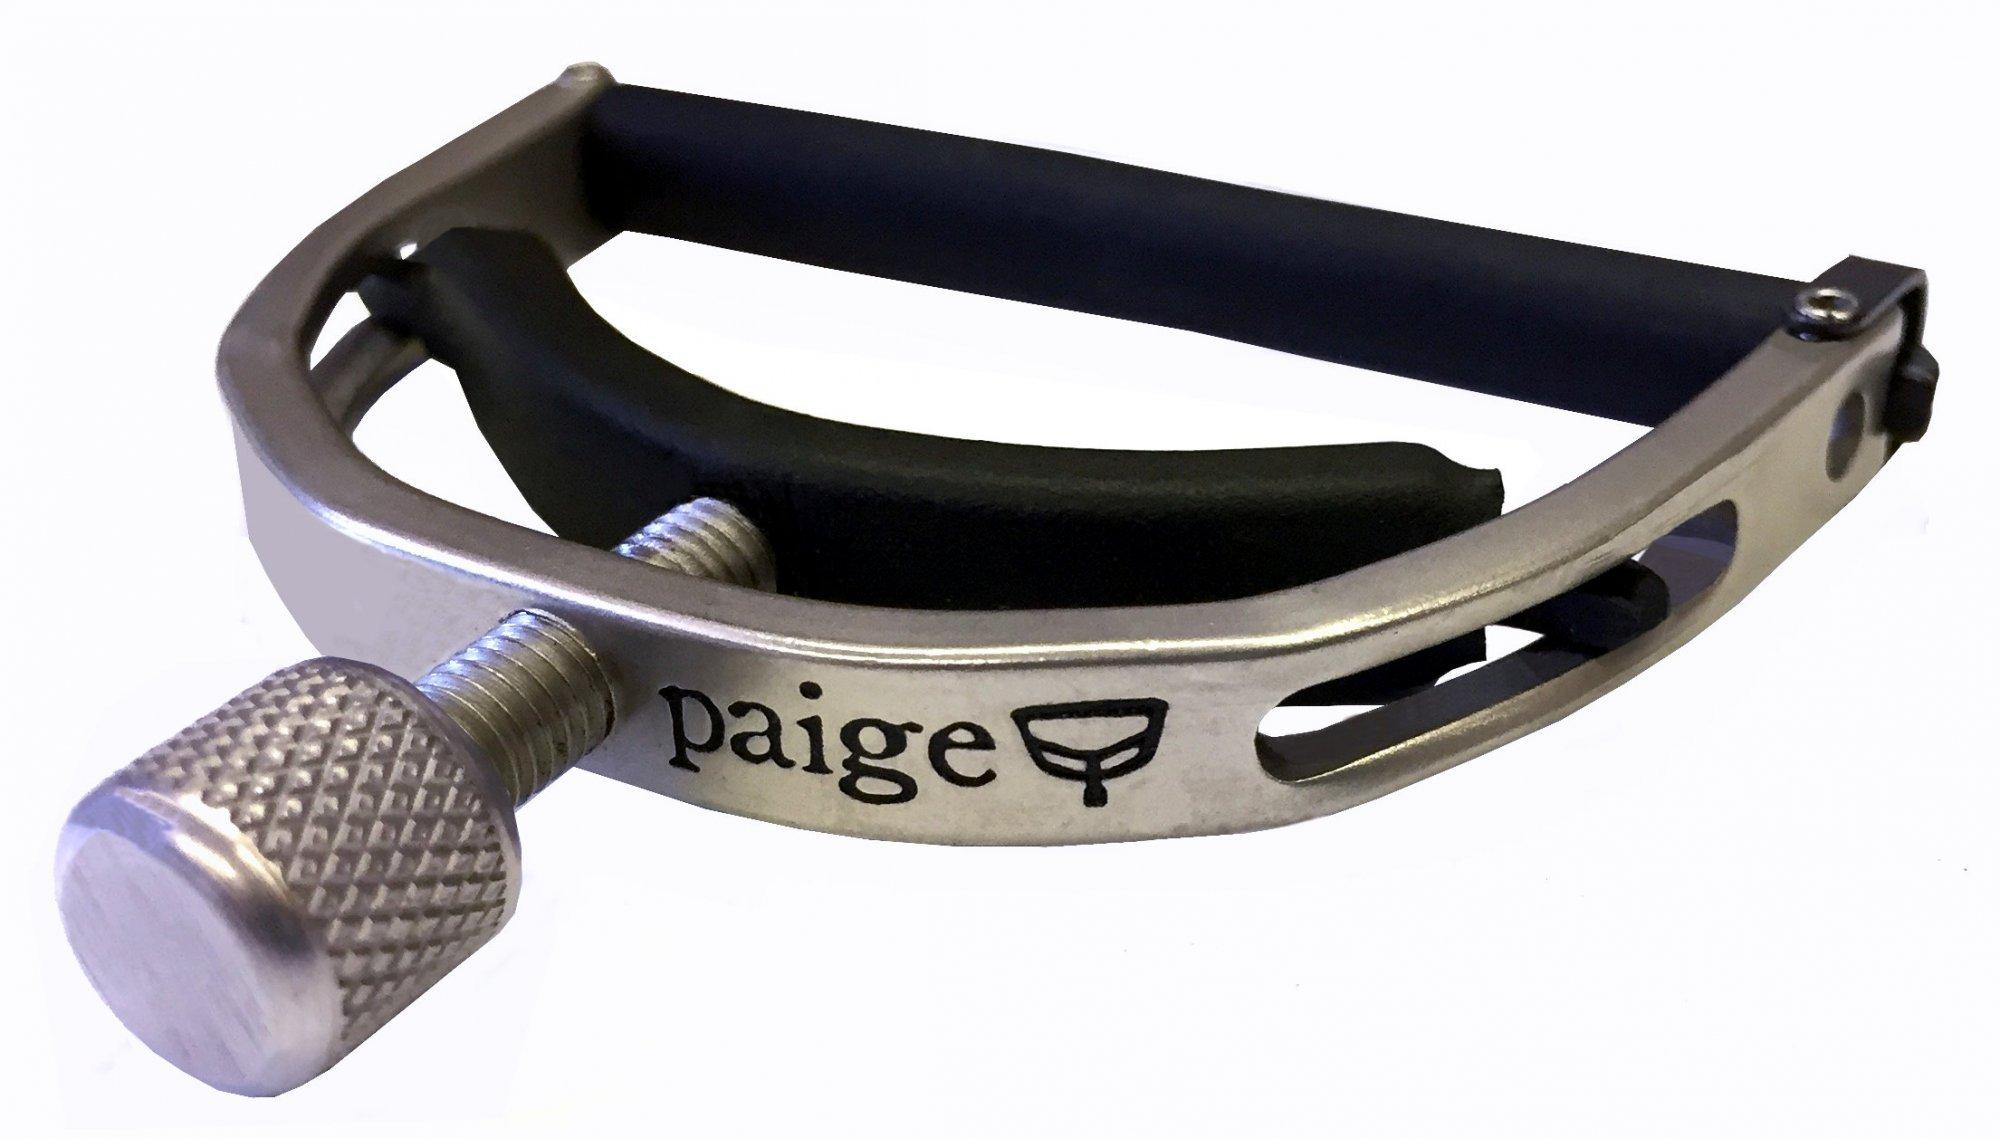 Paige P-BN - The ORIGINAL 5 String Banjo/Mandolin Capo